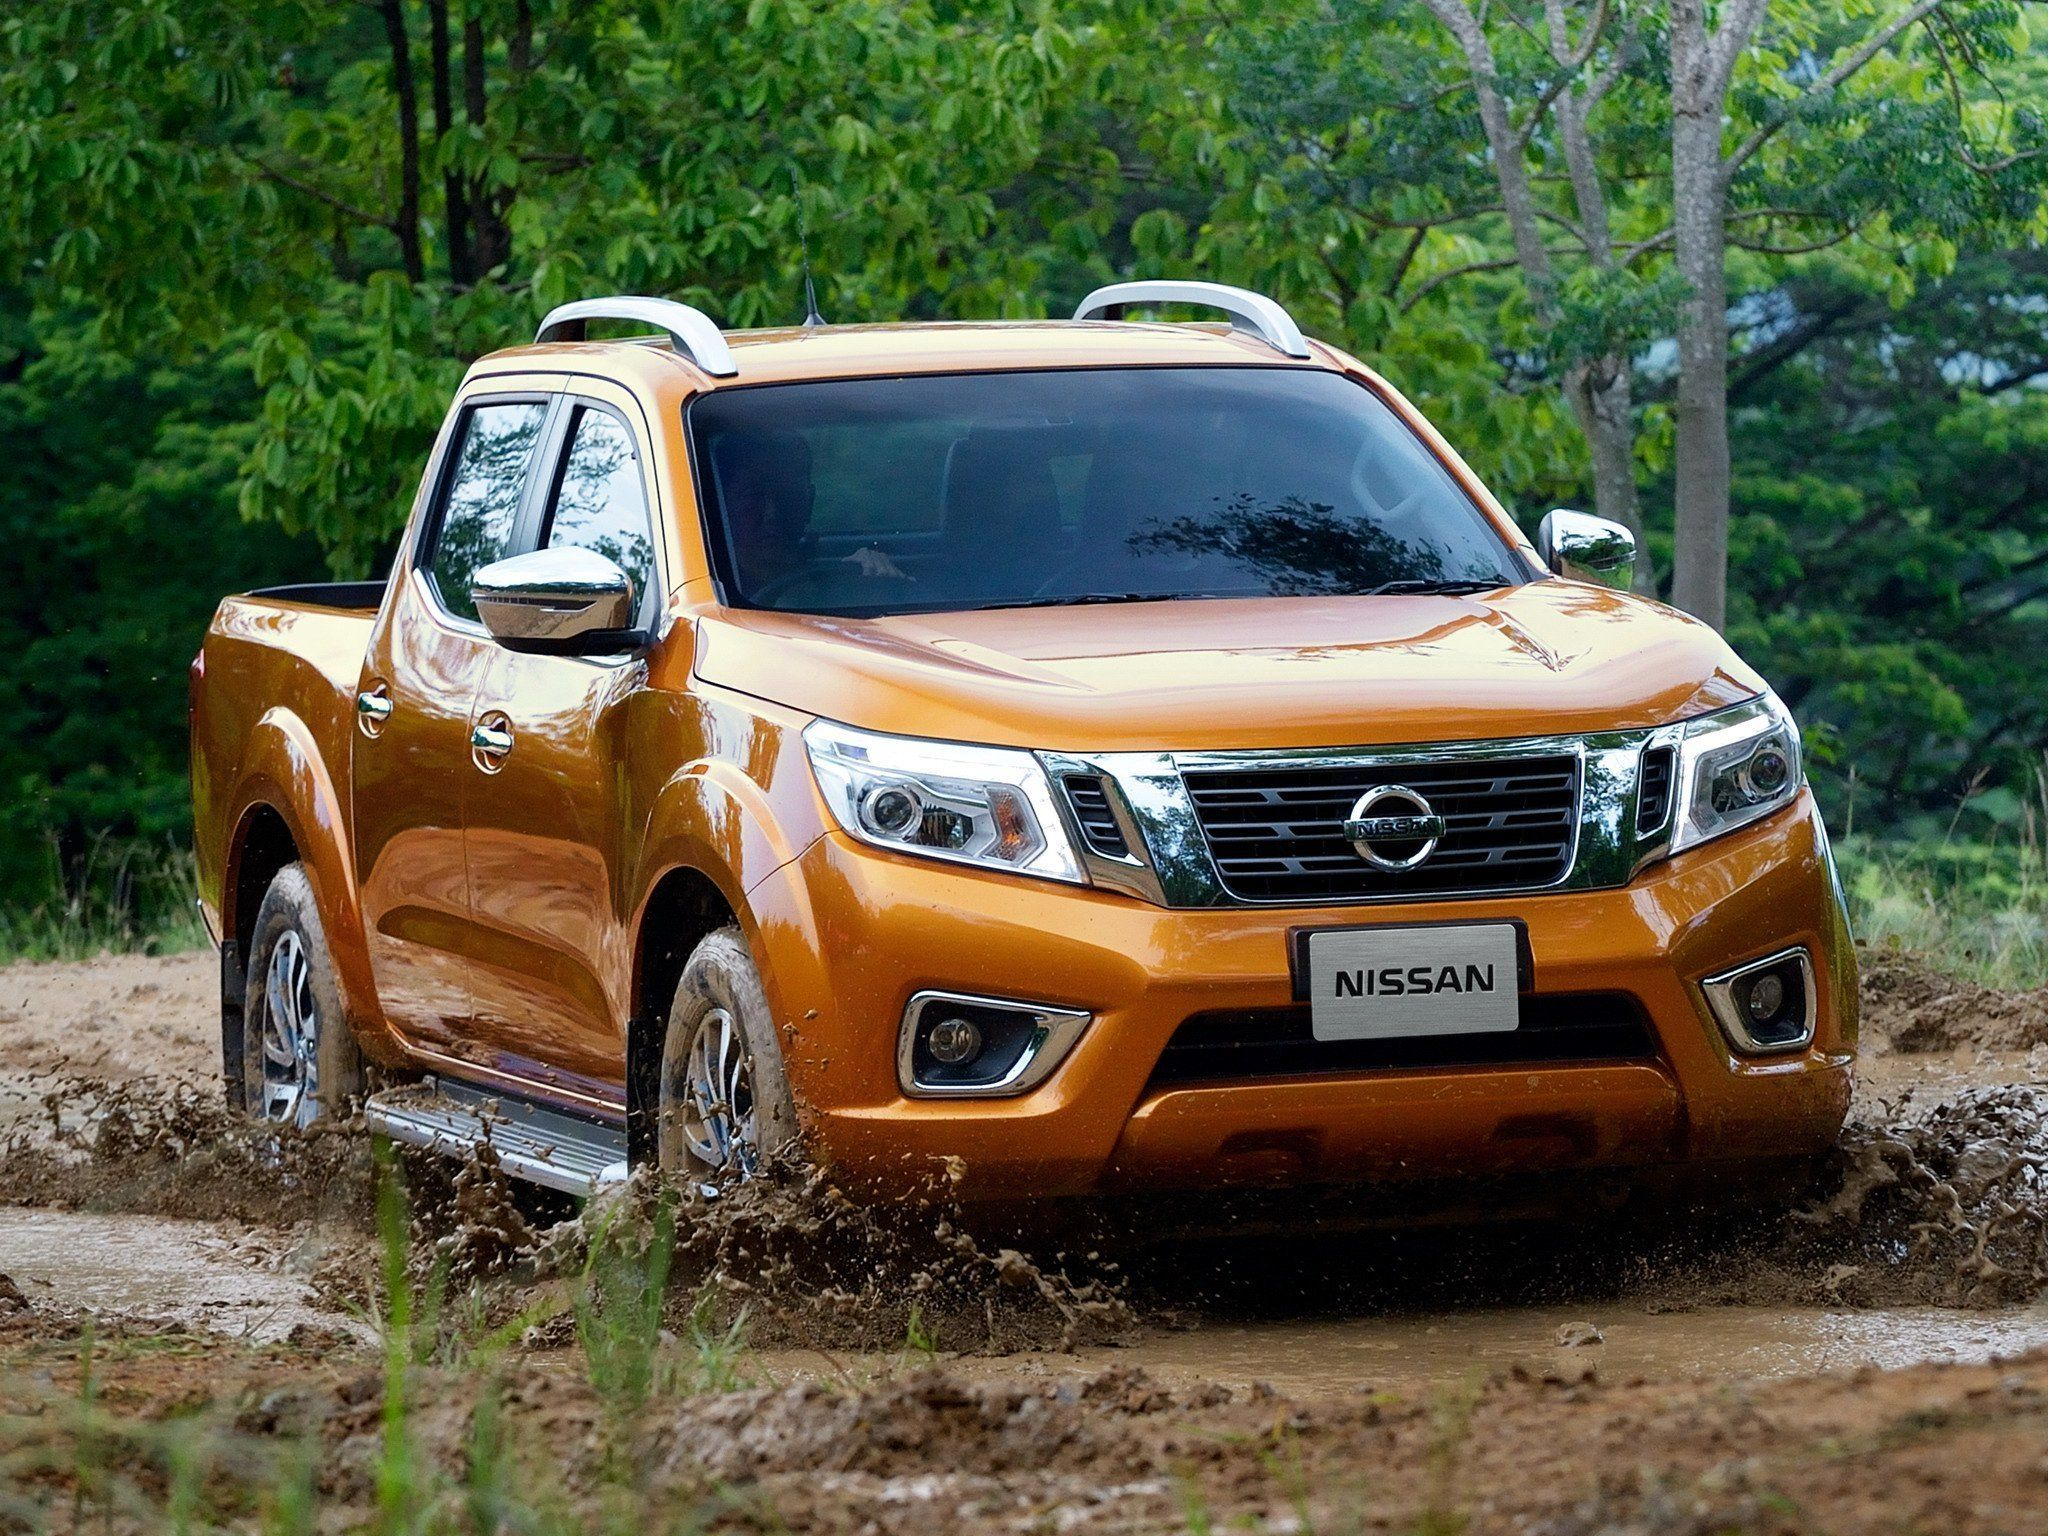 New Nissan Navara 2019 New Release Nissan Navara Nissan